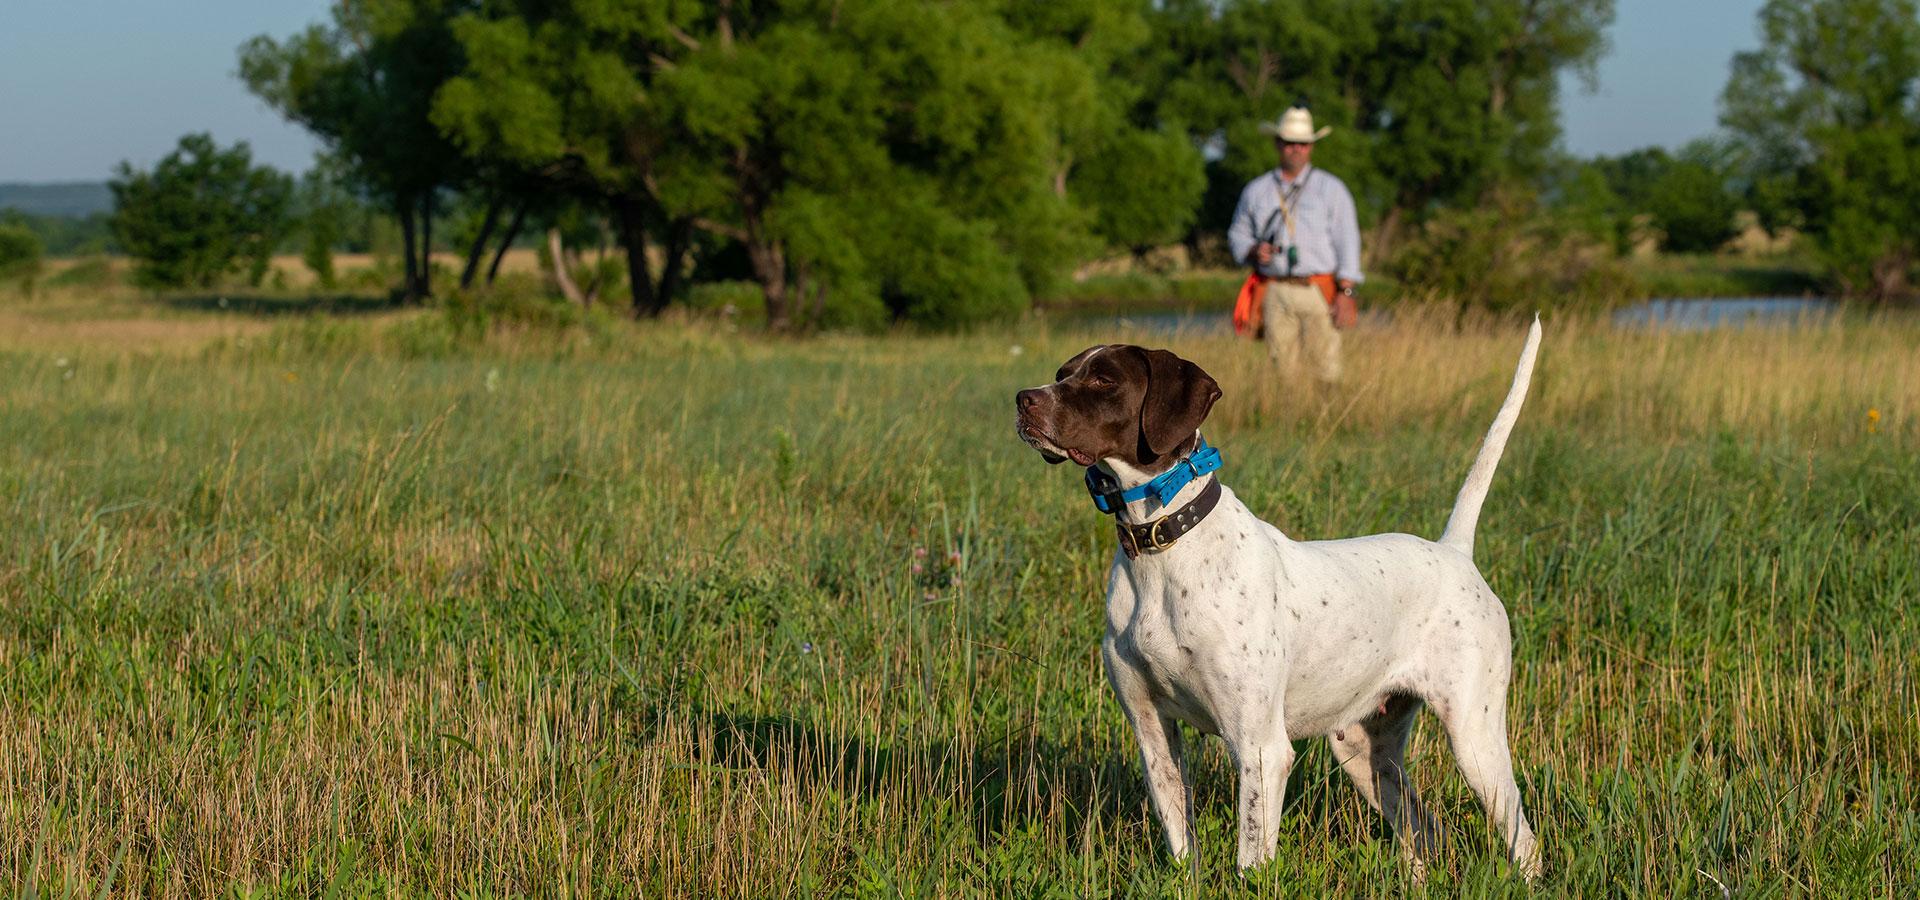 Bird Dog Training, Training Seminars, and Supplies - Ronnie